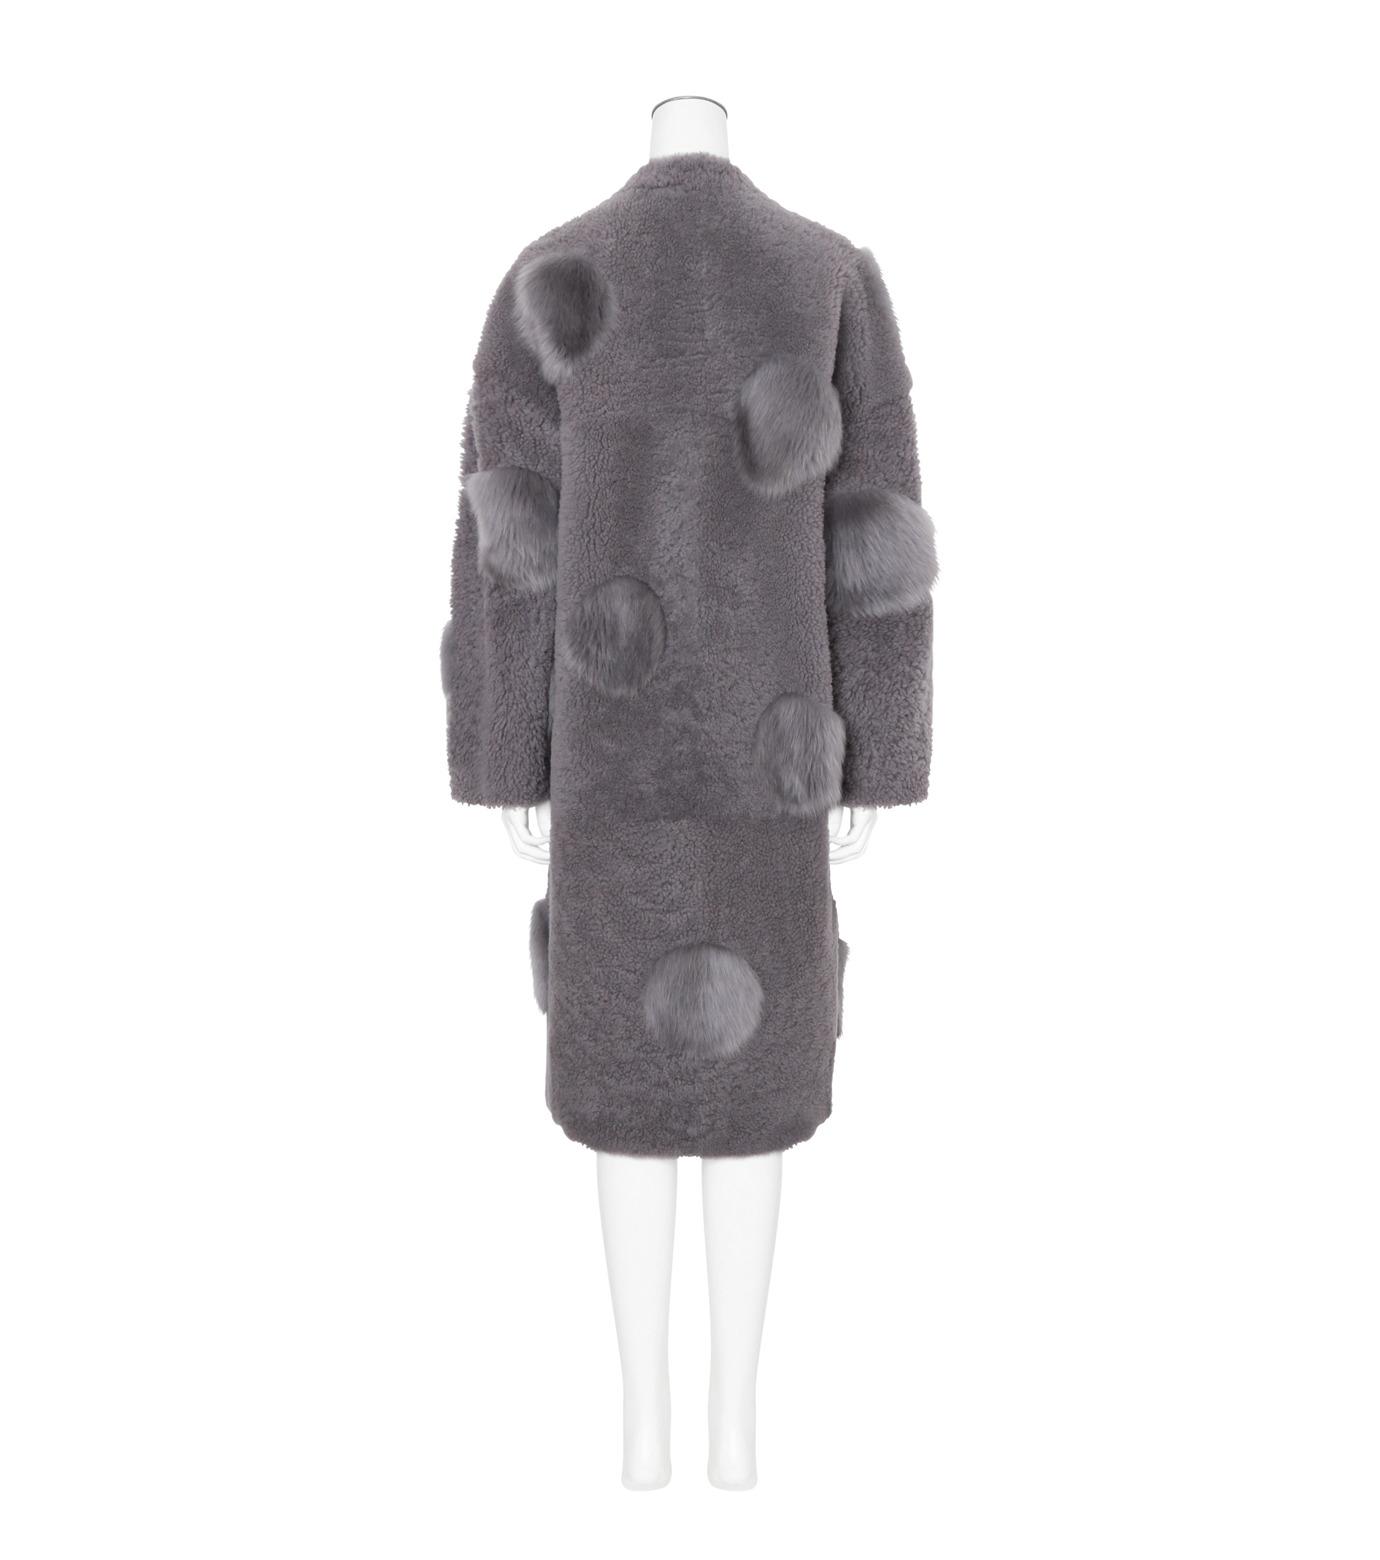 ANNE VEST(アンベスト)のLayla Coat w/Dots Reversible-GRAY-AW160121005-11 拡大詳細画像2